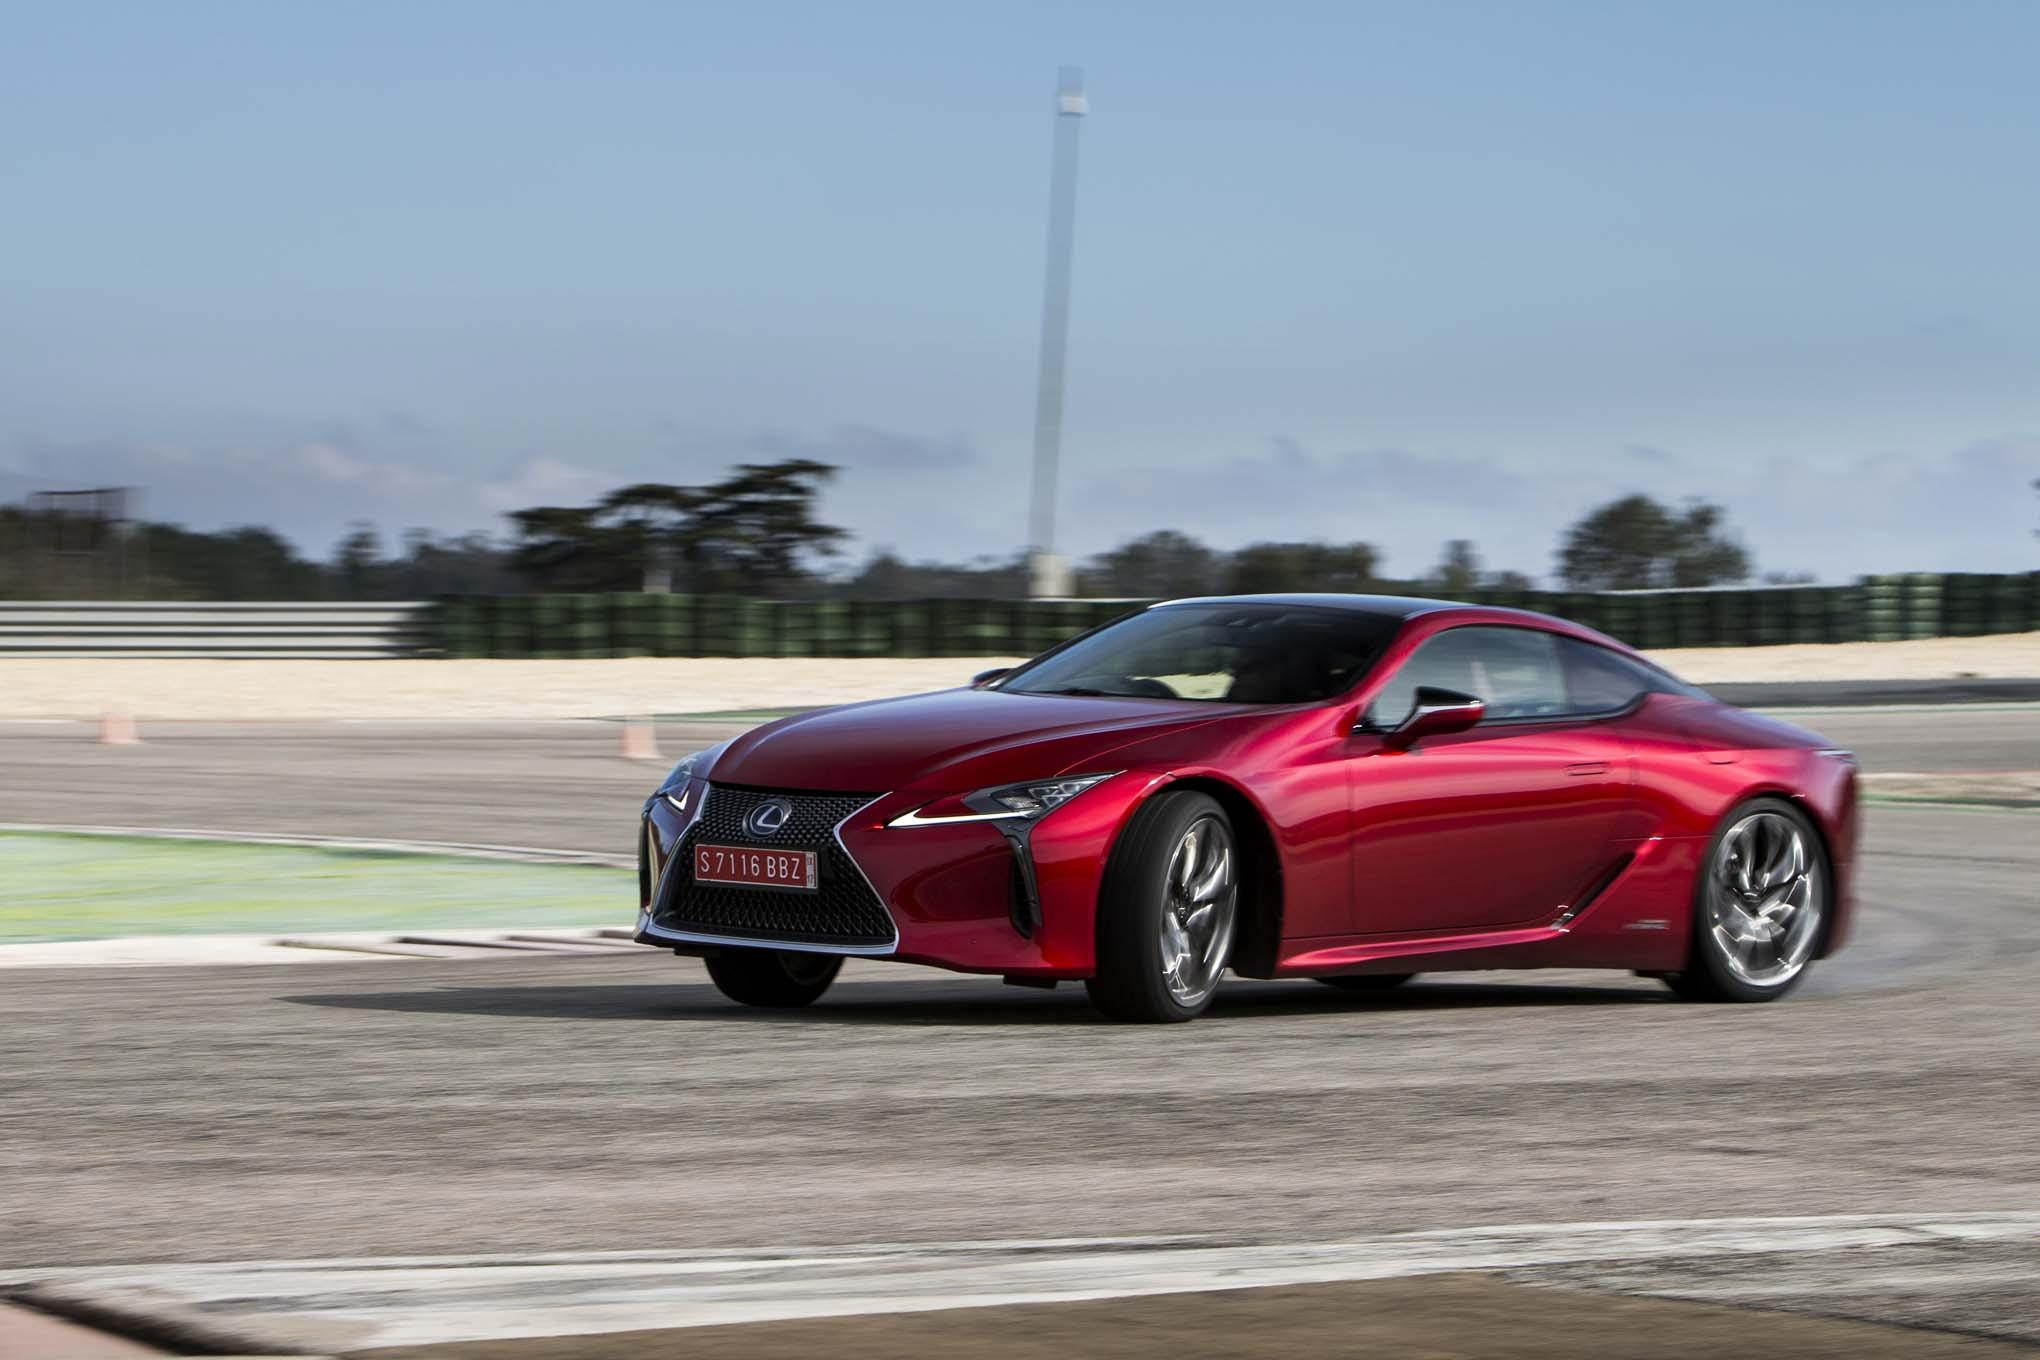 2018 Lexus Lc 500h Quick Take Review Automobile Magazine